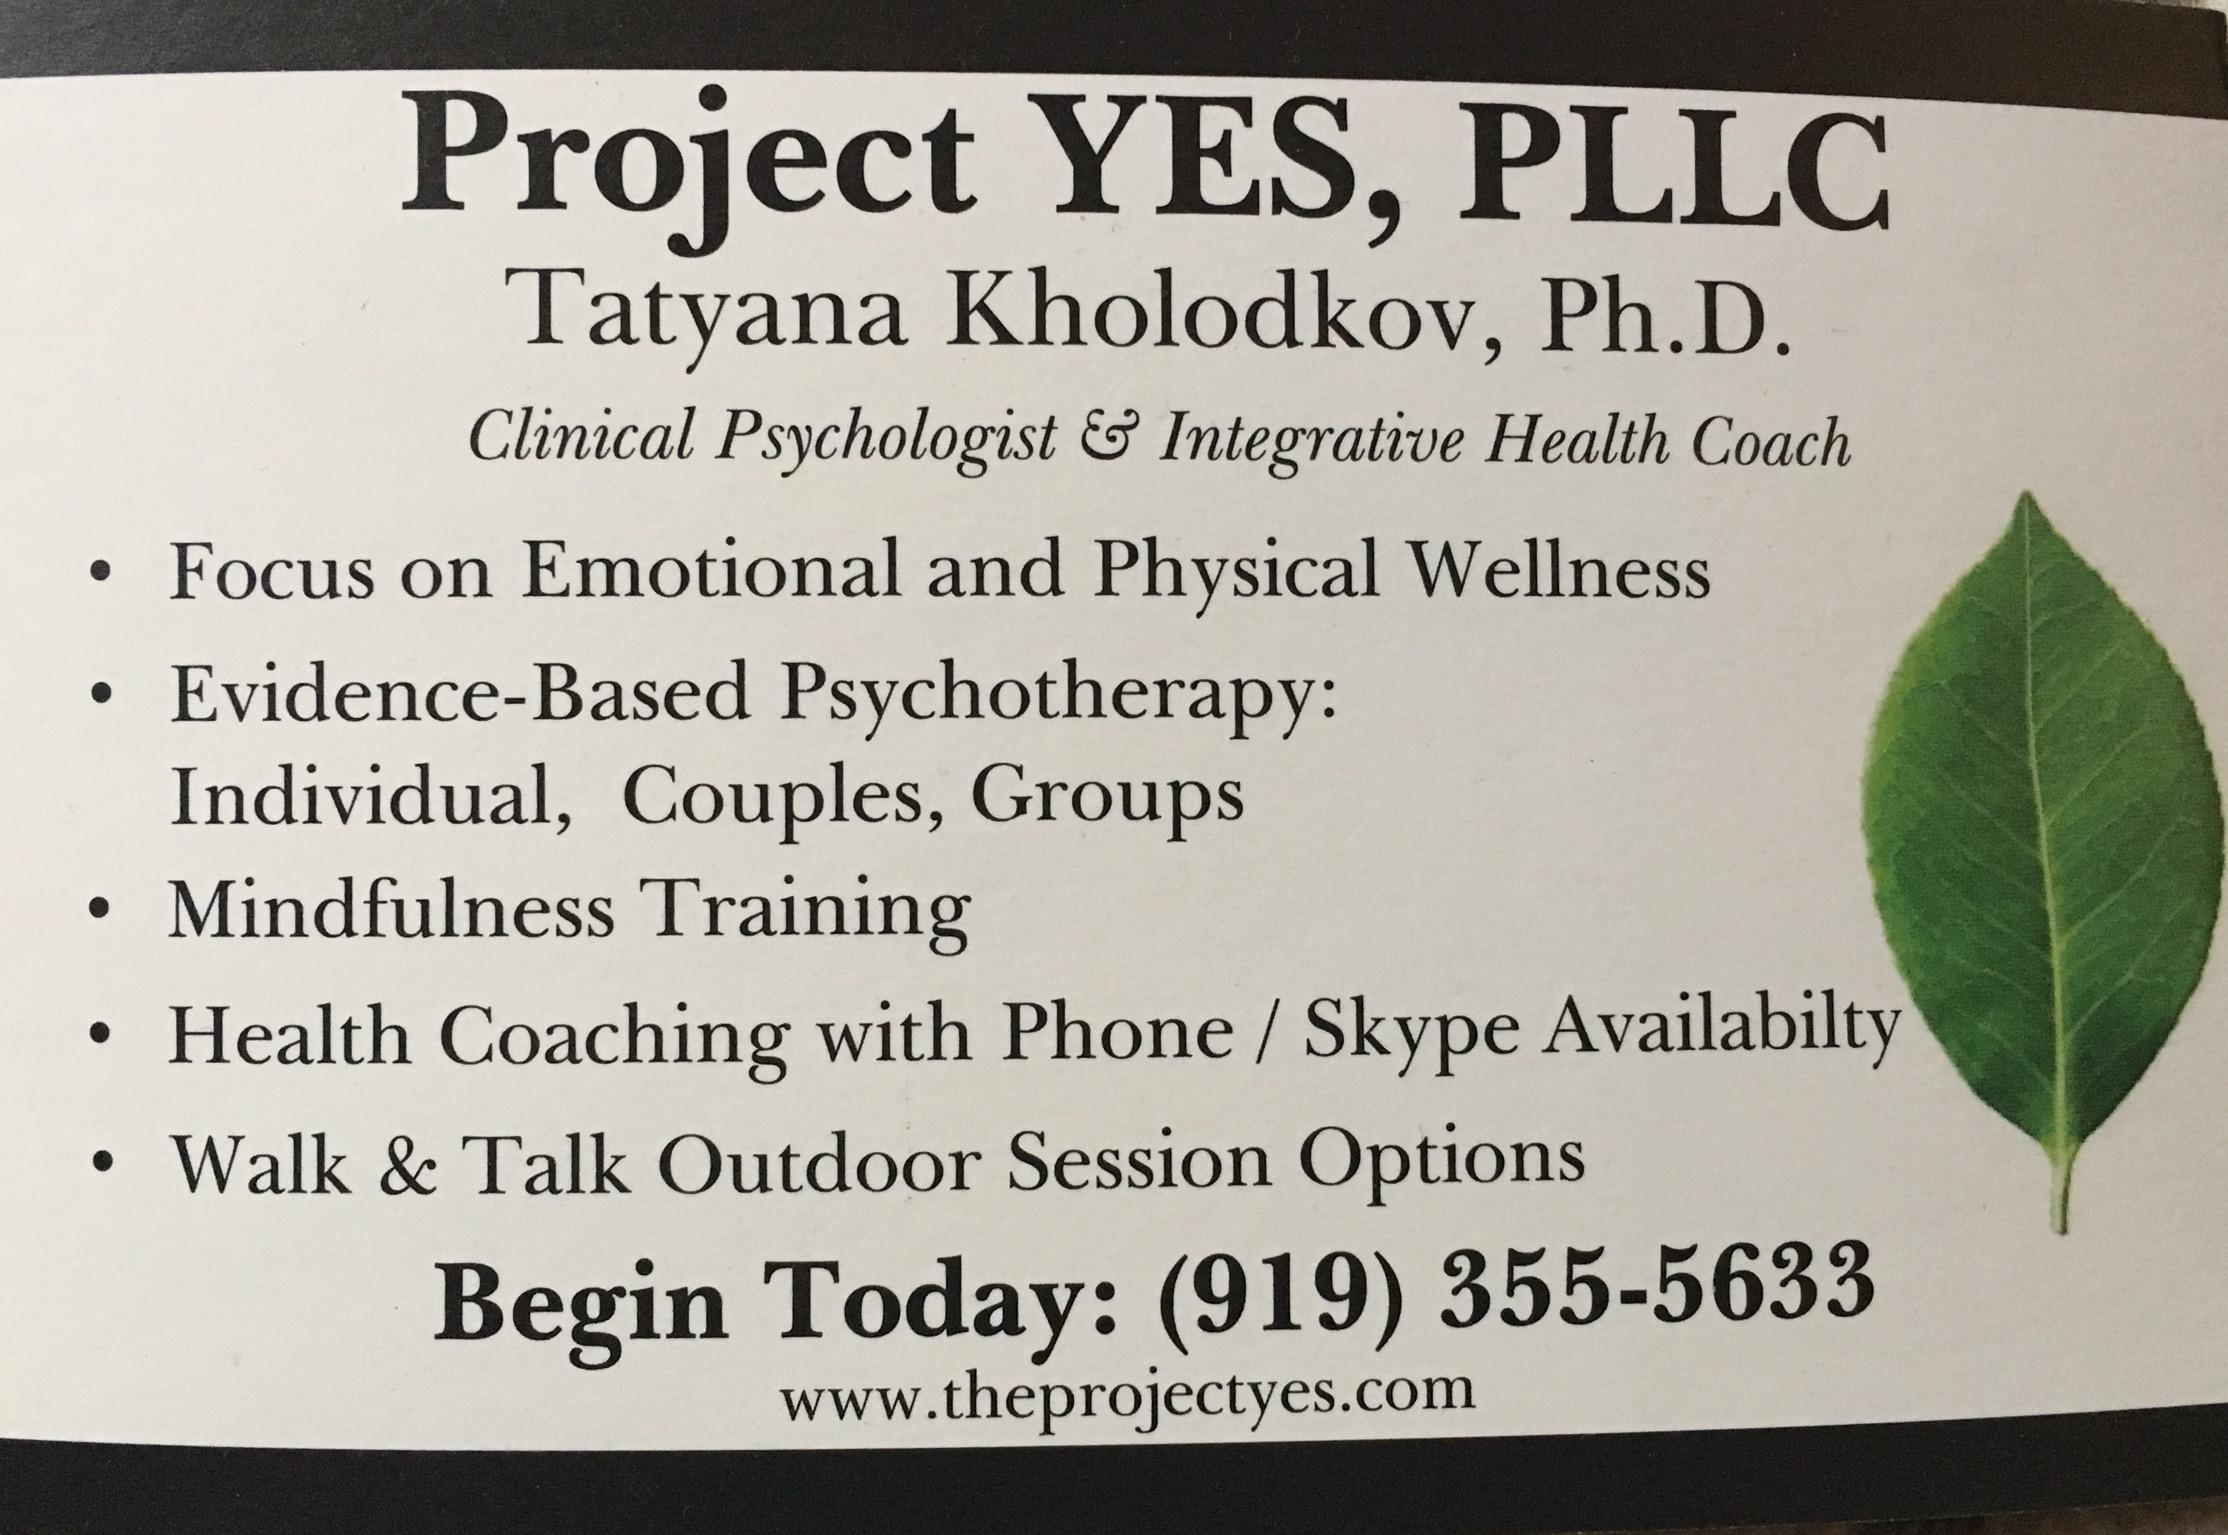 Project Yes- Tatyana Kholodkov, PhD